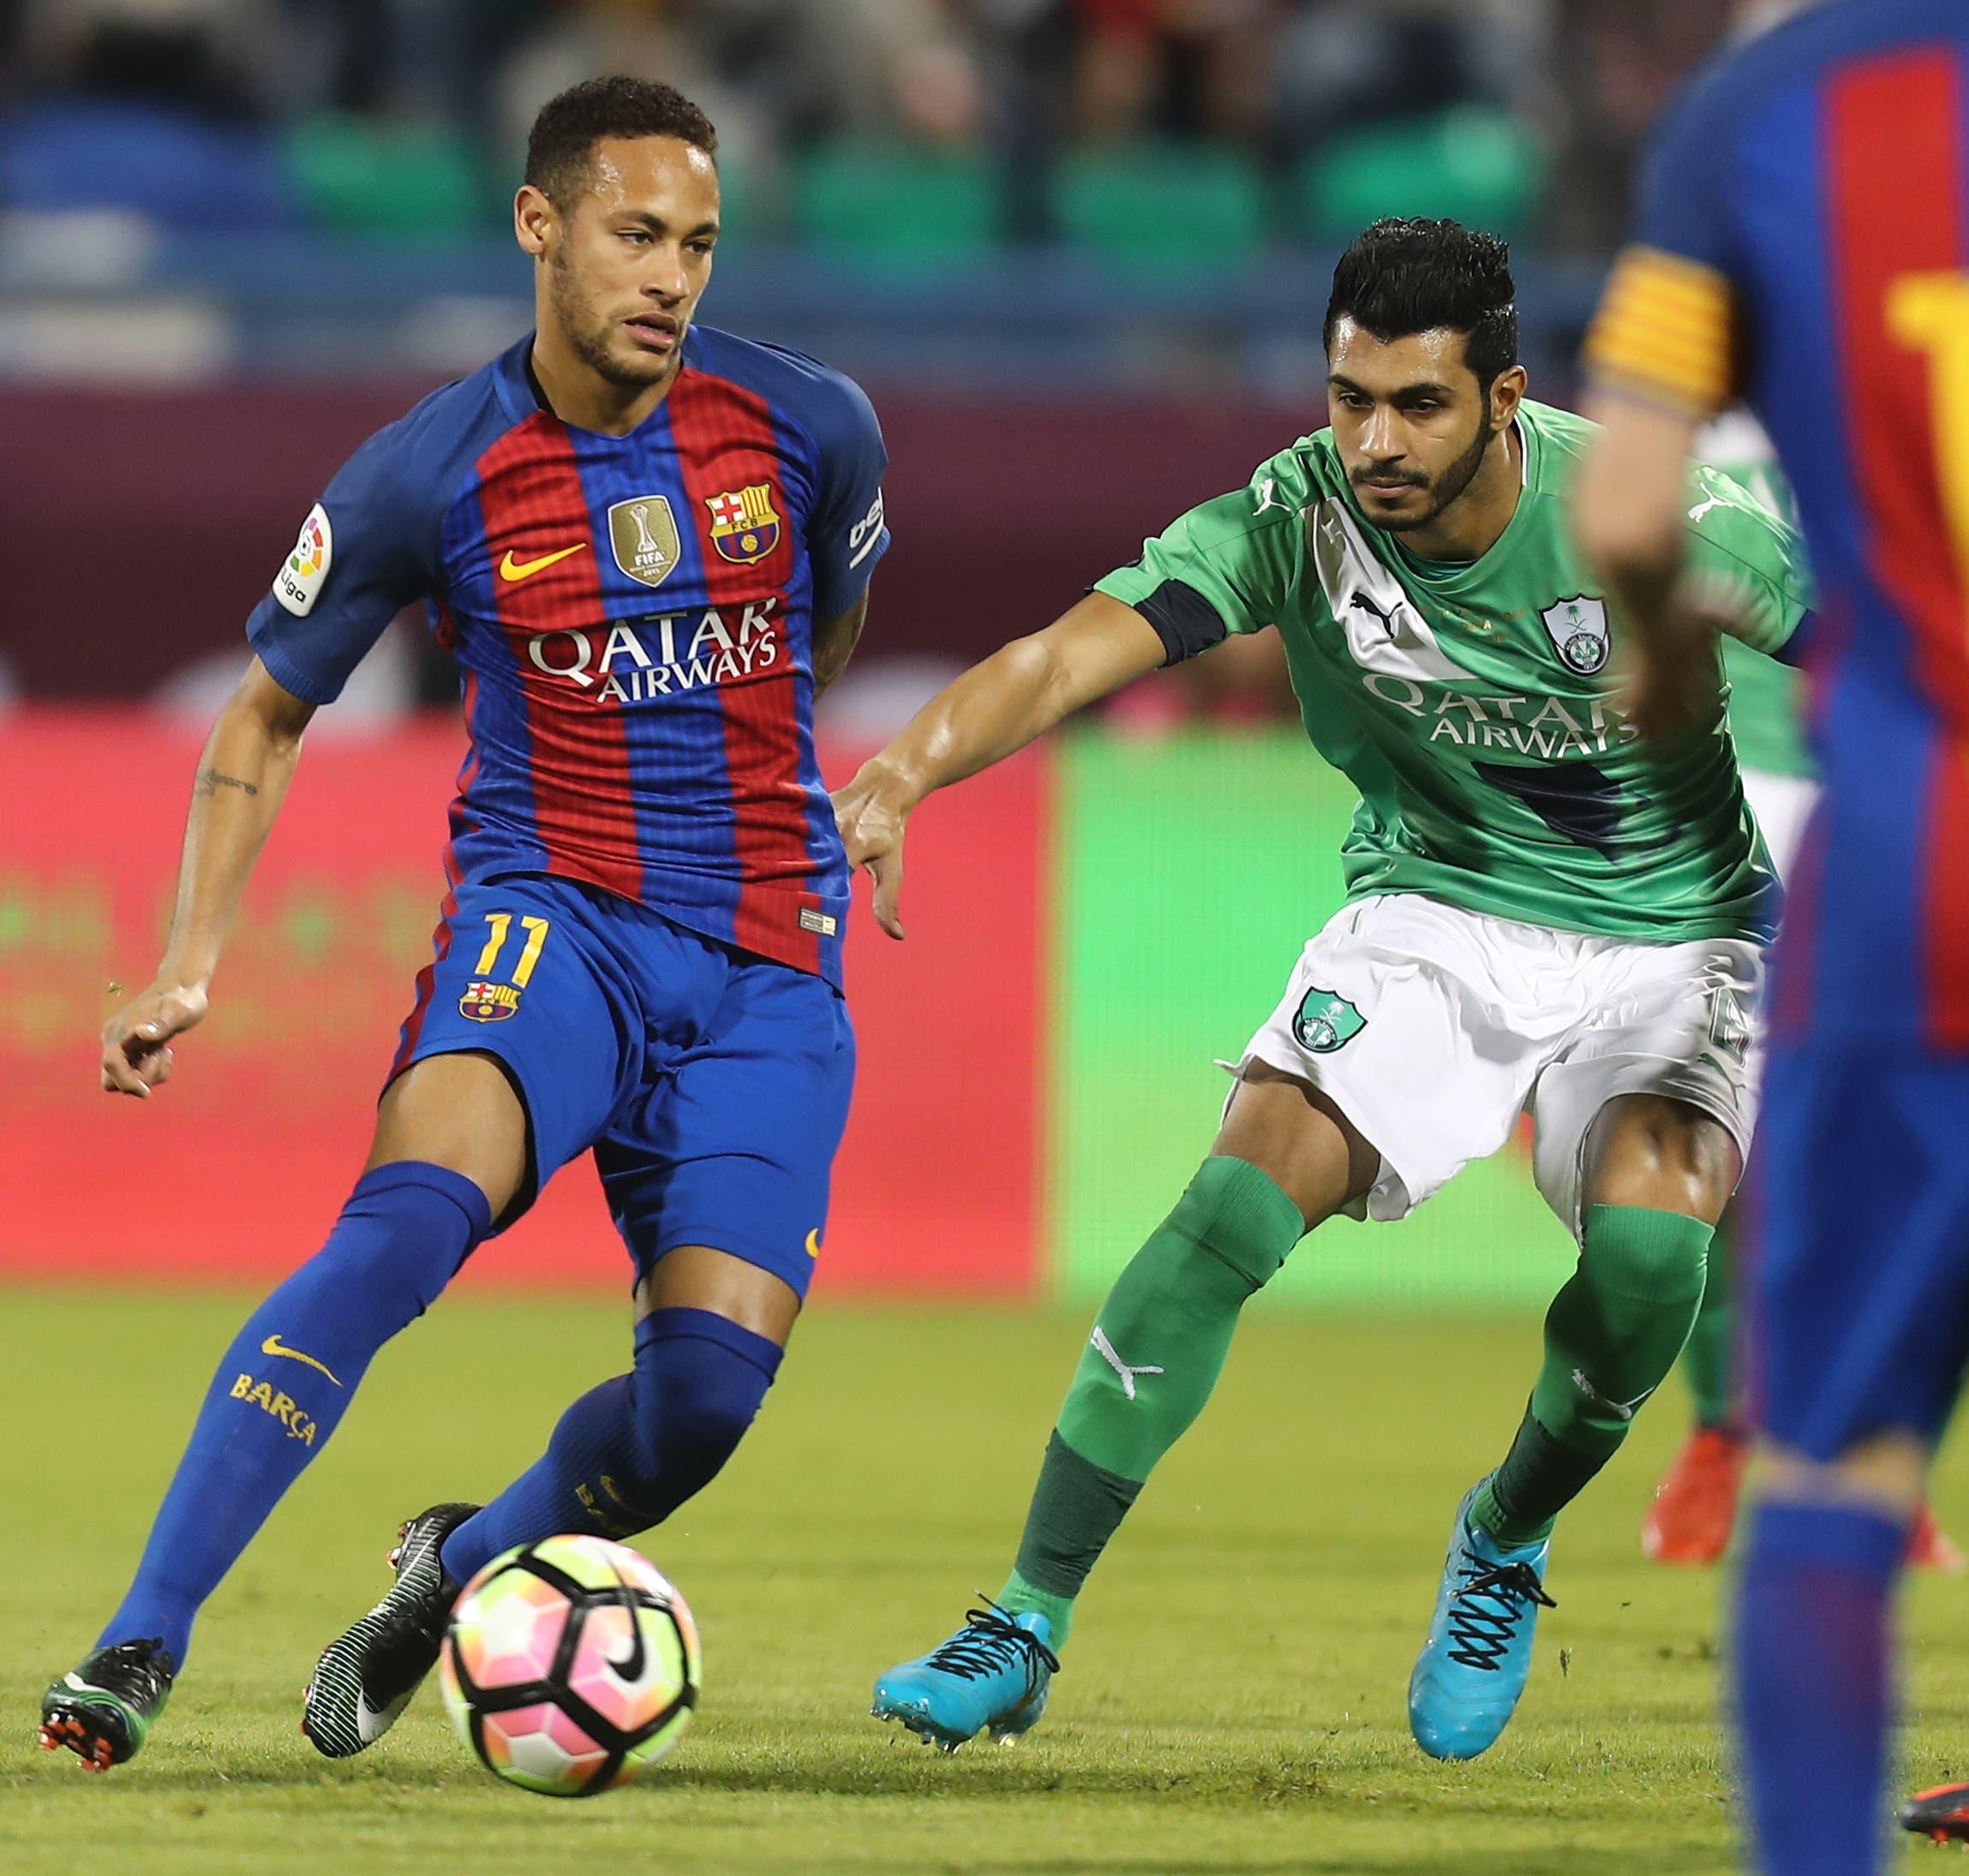 FC Barcelona's Neymar (L) vies with Al-Ahli's Mohammed al-Fatil during a friendly football match between FC Barcelona and Saudi Arabia's Al-Ahli FC on December 13, 2016 in the Qatari capital Doha. (AFP)